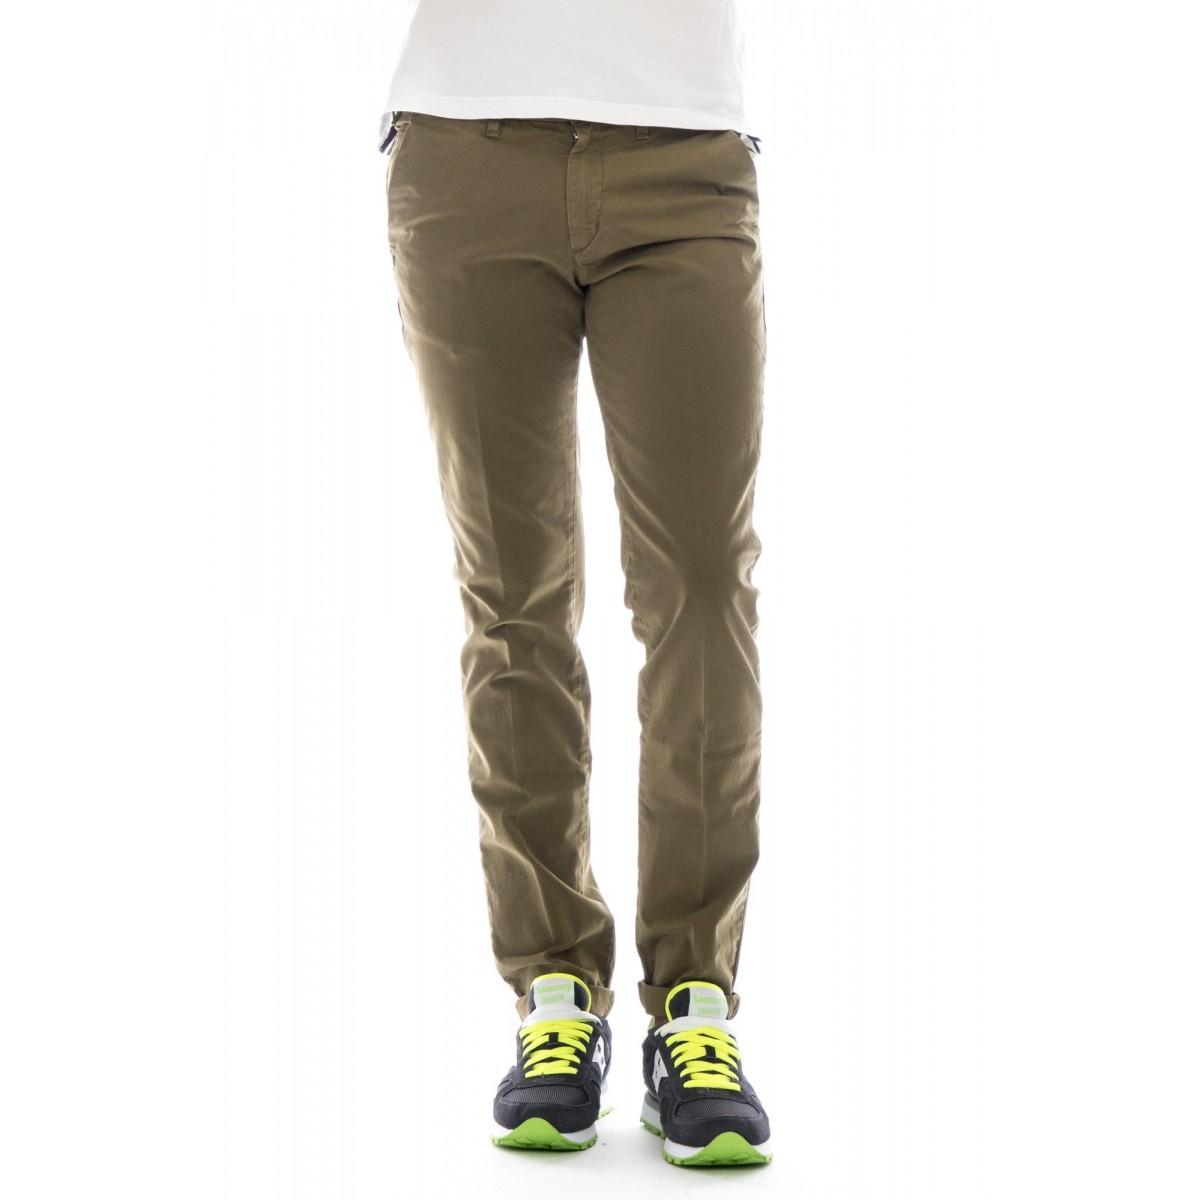 Pantalone uomo - Lenny 396 tinta unita